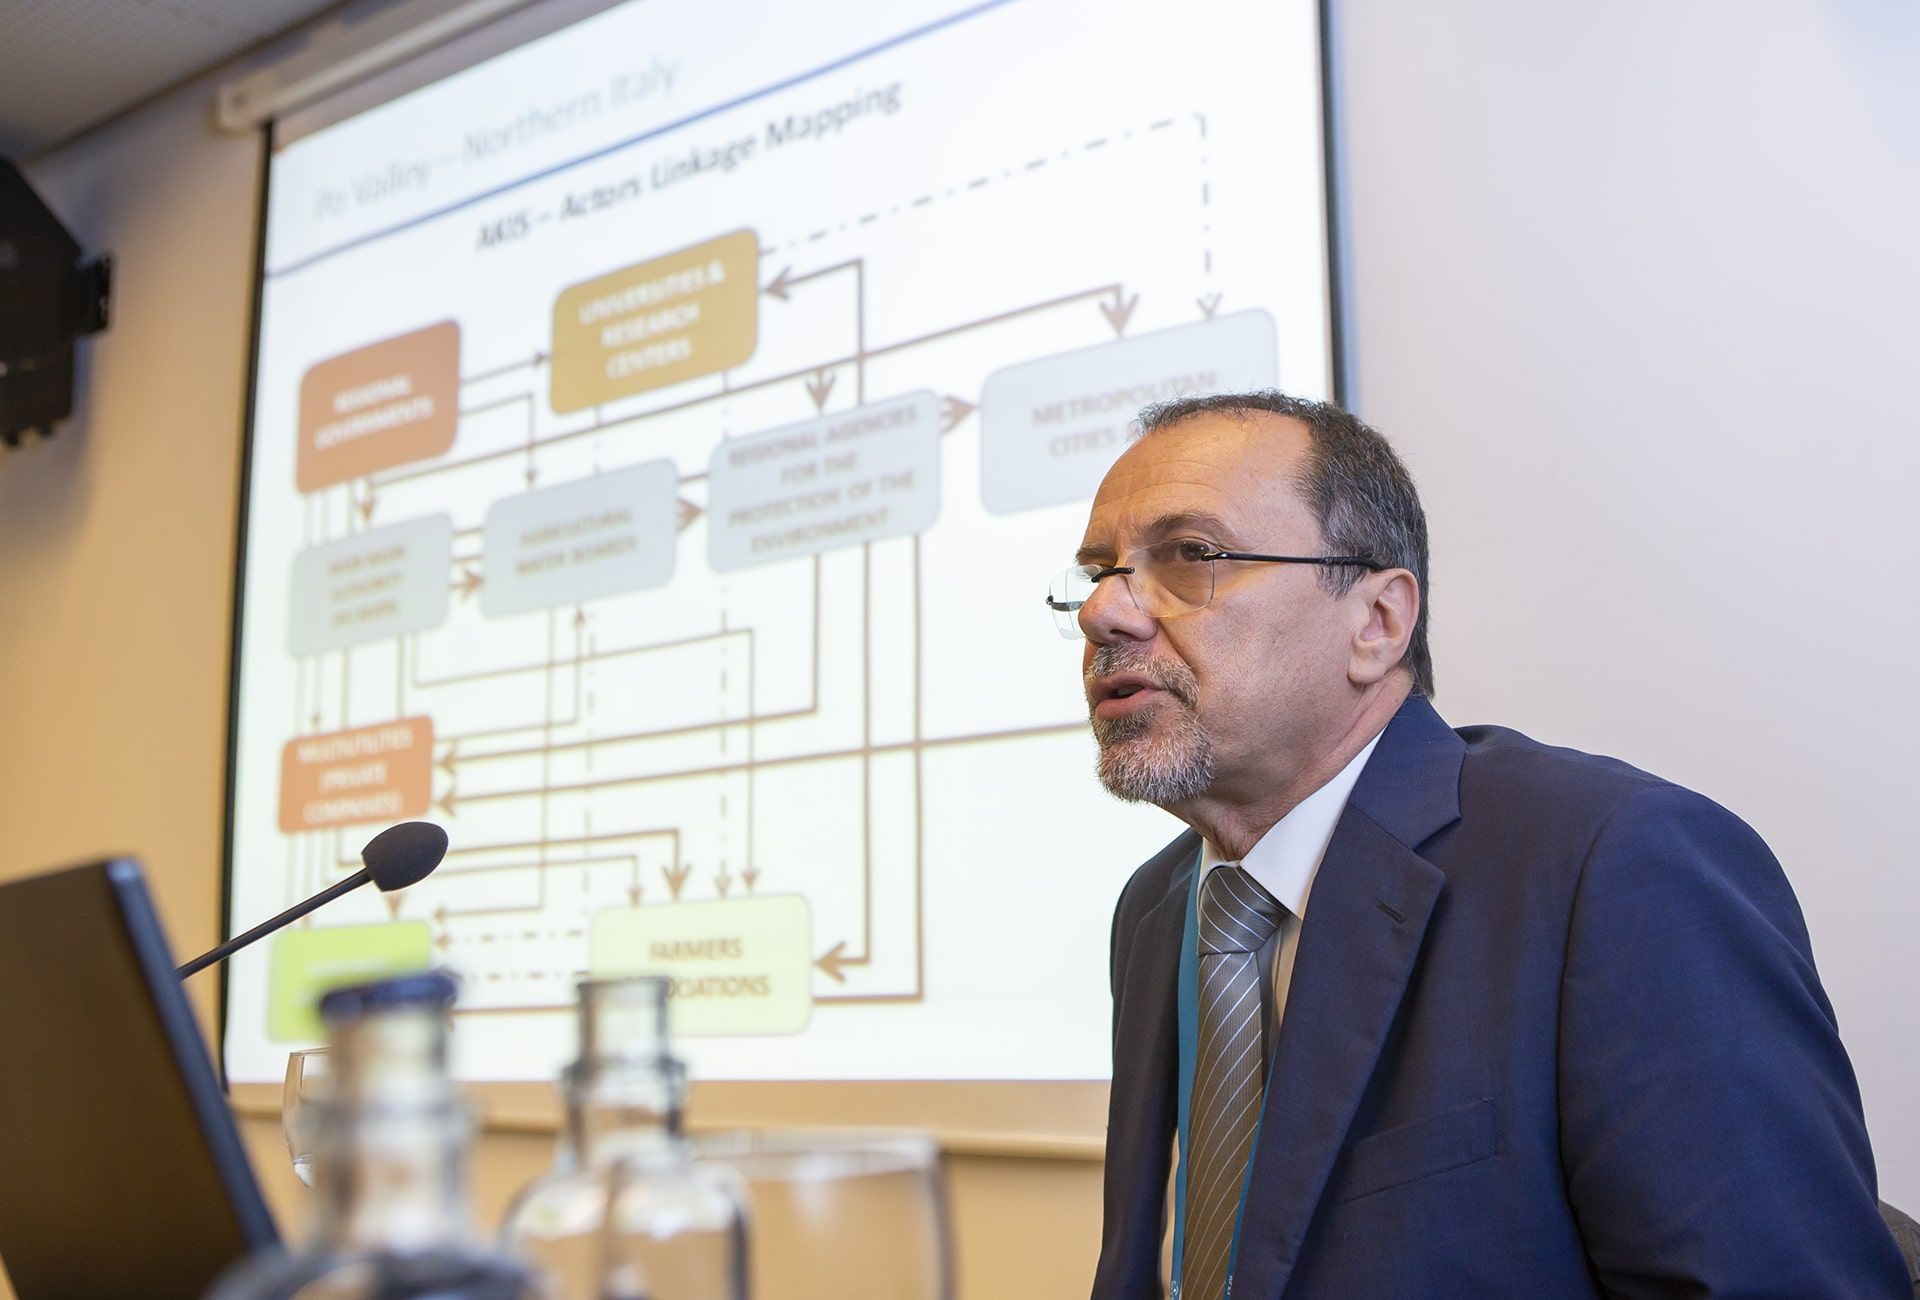 Adriano Battalini (CER) presenta la región Po river basin